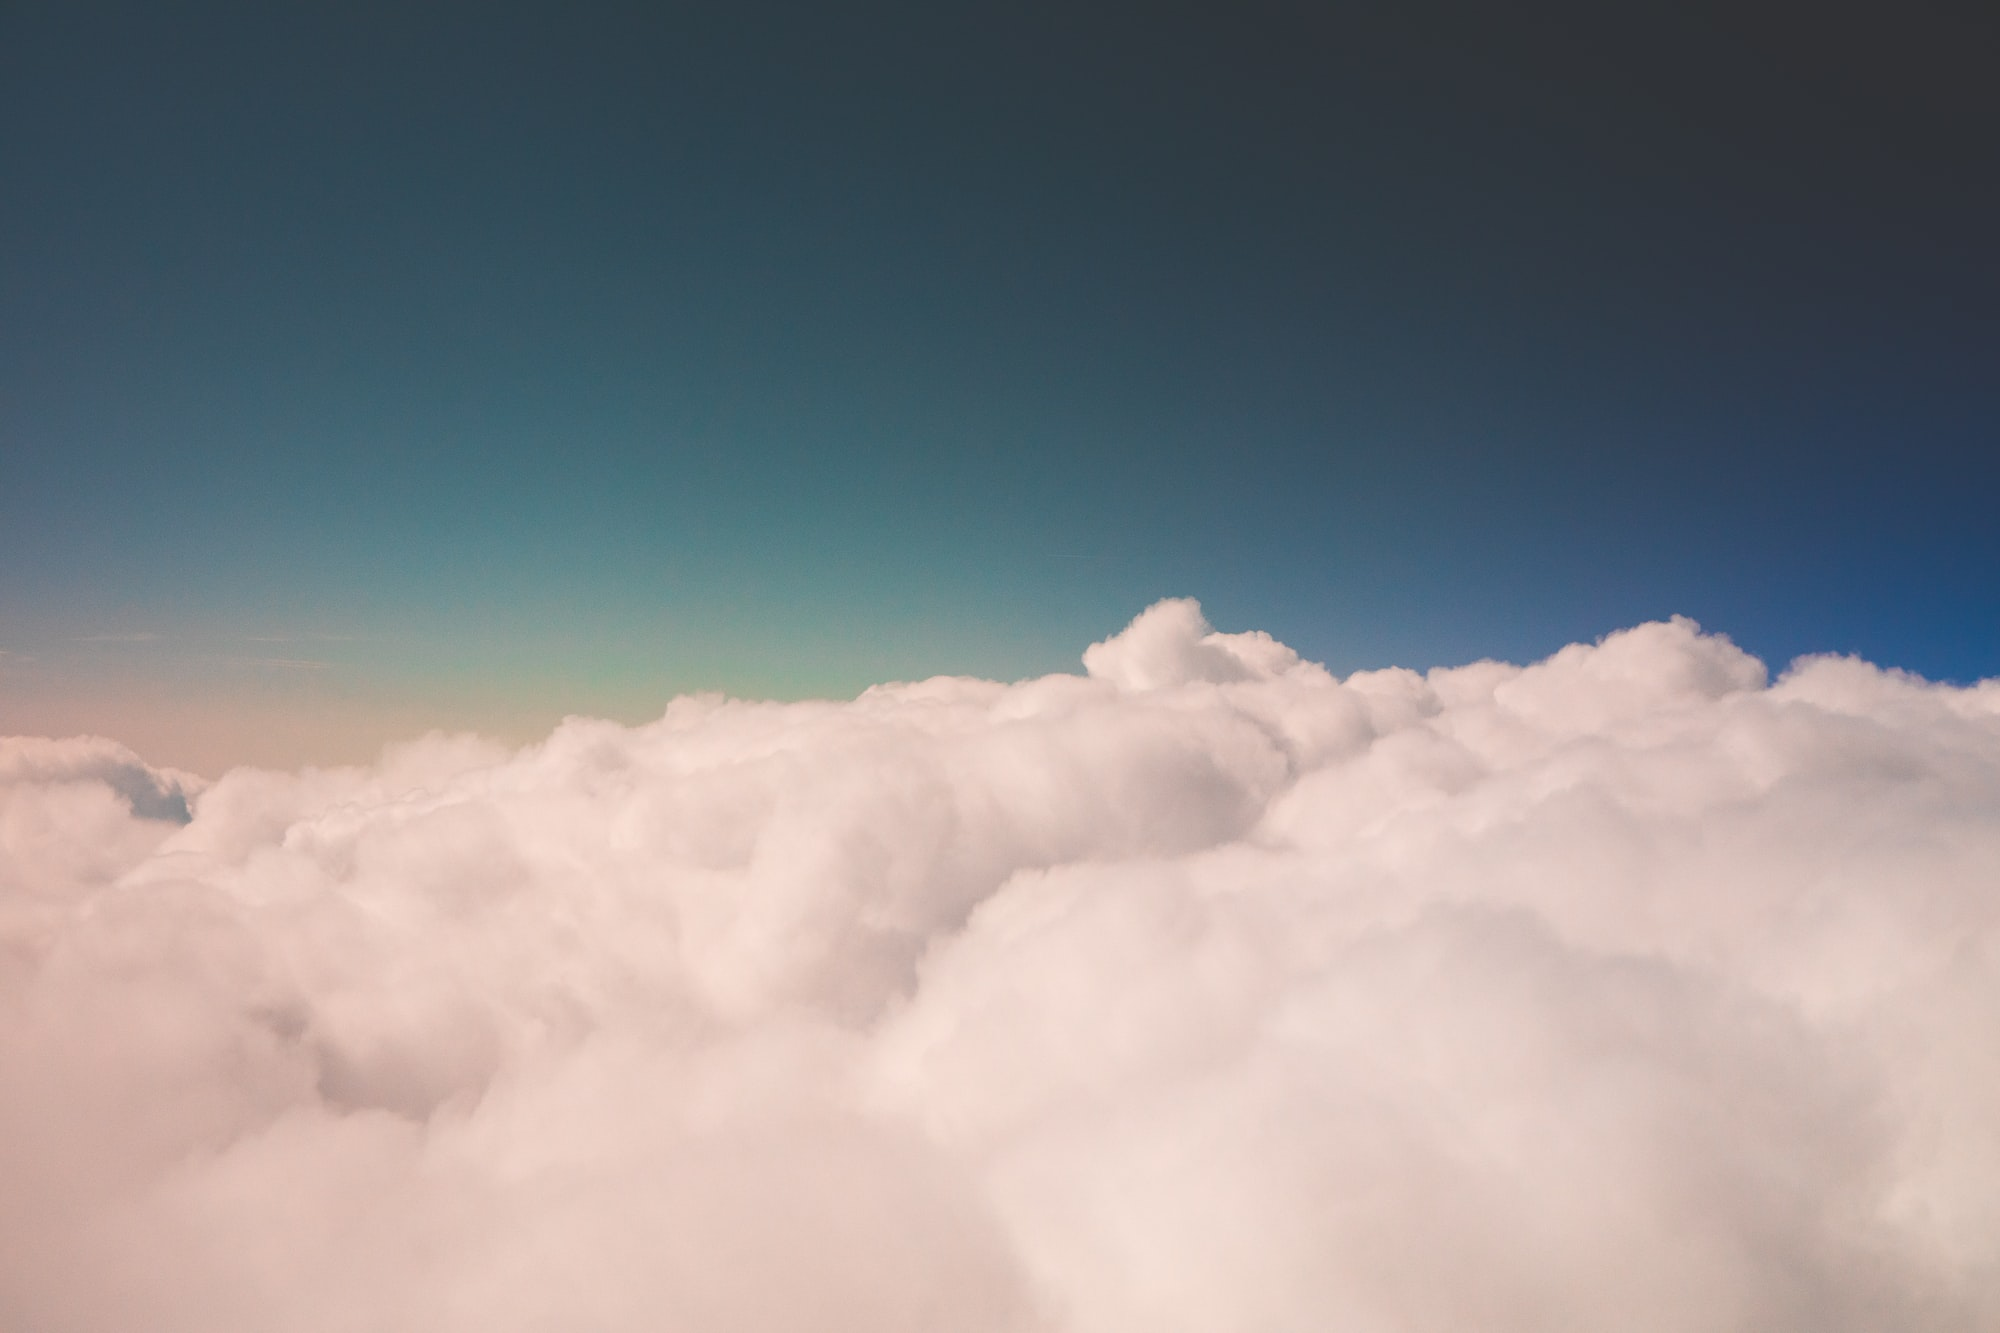 No. 105: Dreams within Dreams within Dreams